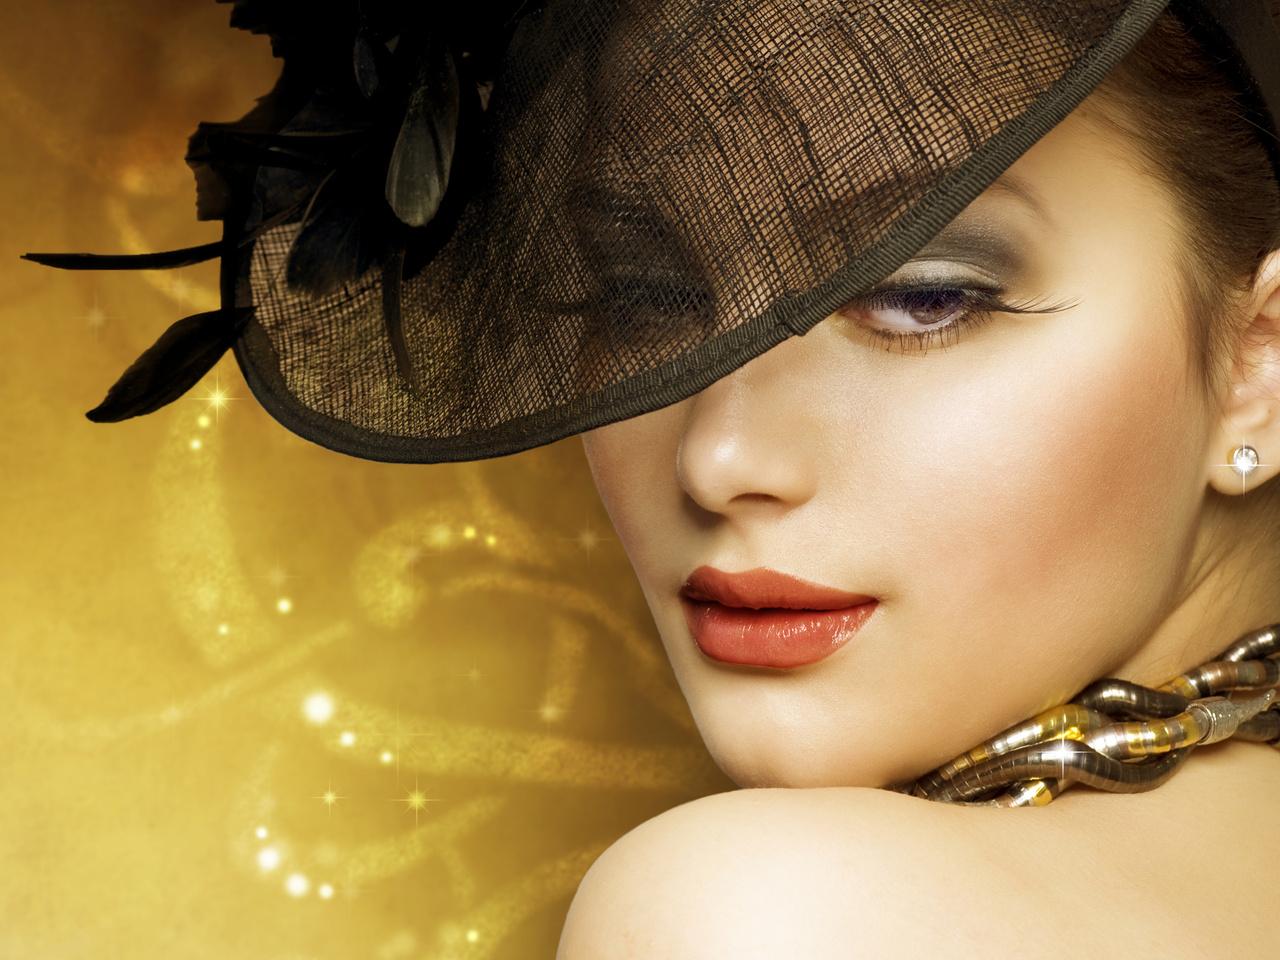 Download 2013 hd Beautiful Girls Wallpapers r Desktop Backgrounds 1280x960